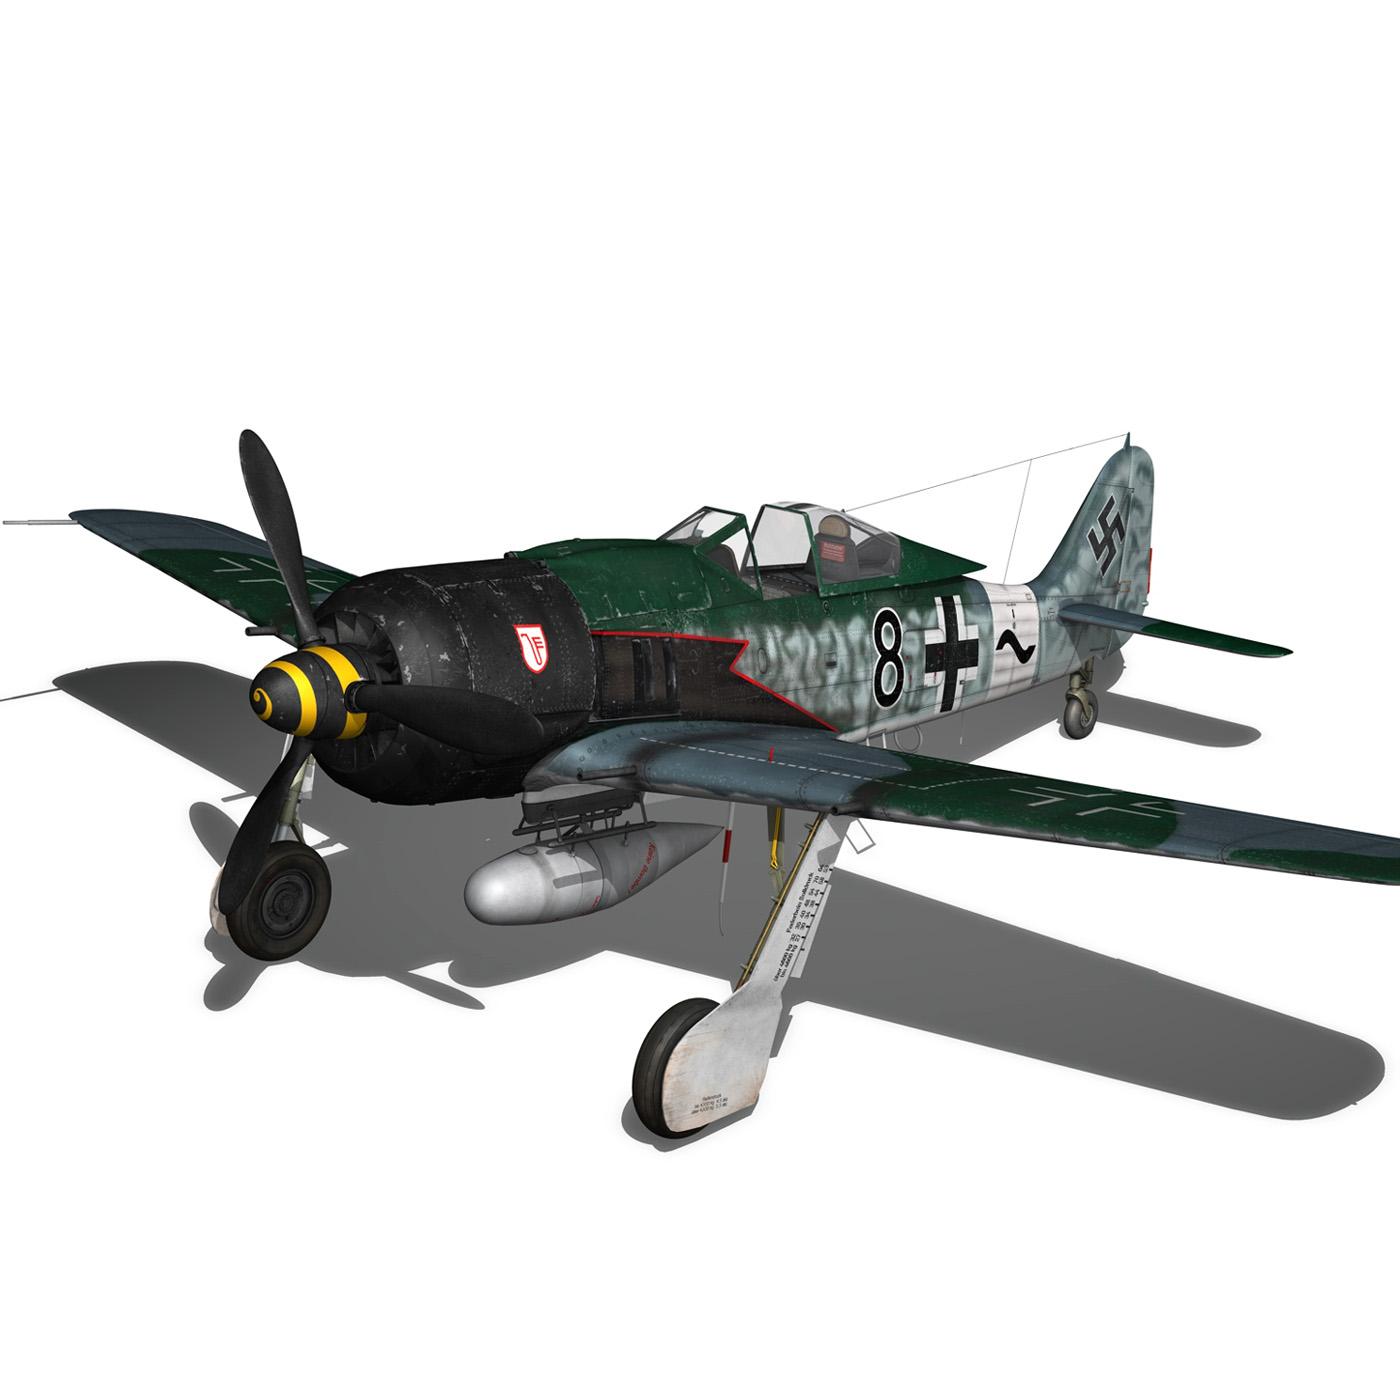 focke wulf – fw190 a8 – black 8 3d model 3ds c4d fbx lwo lw lws obj 266059